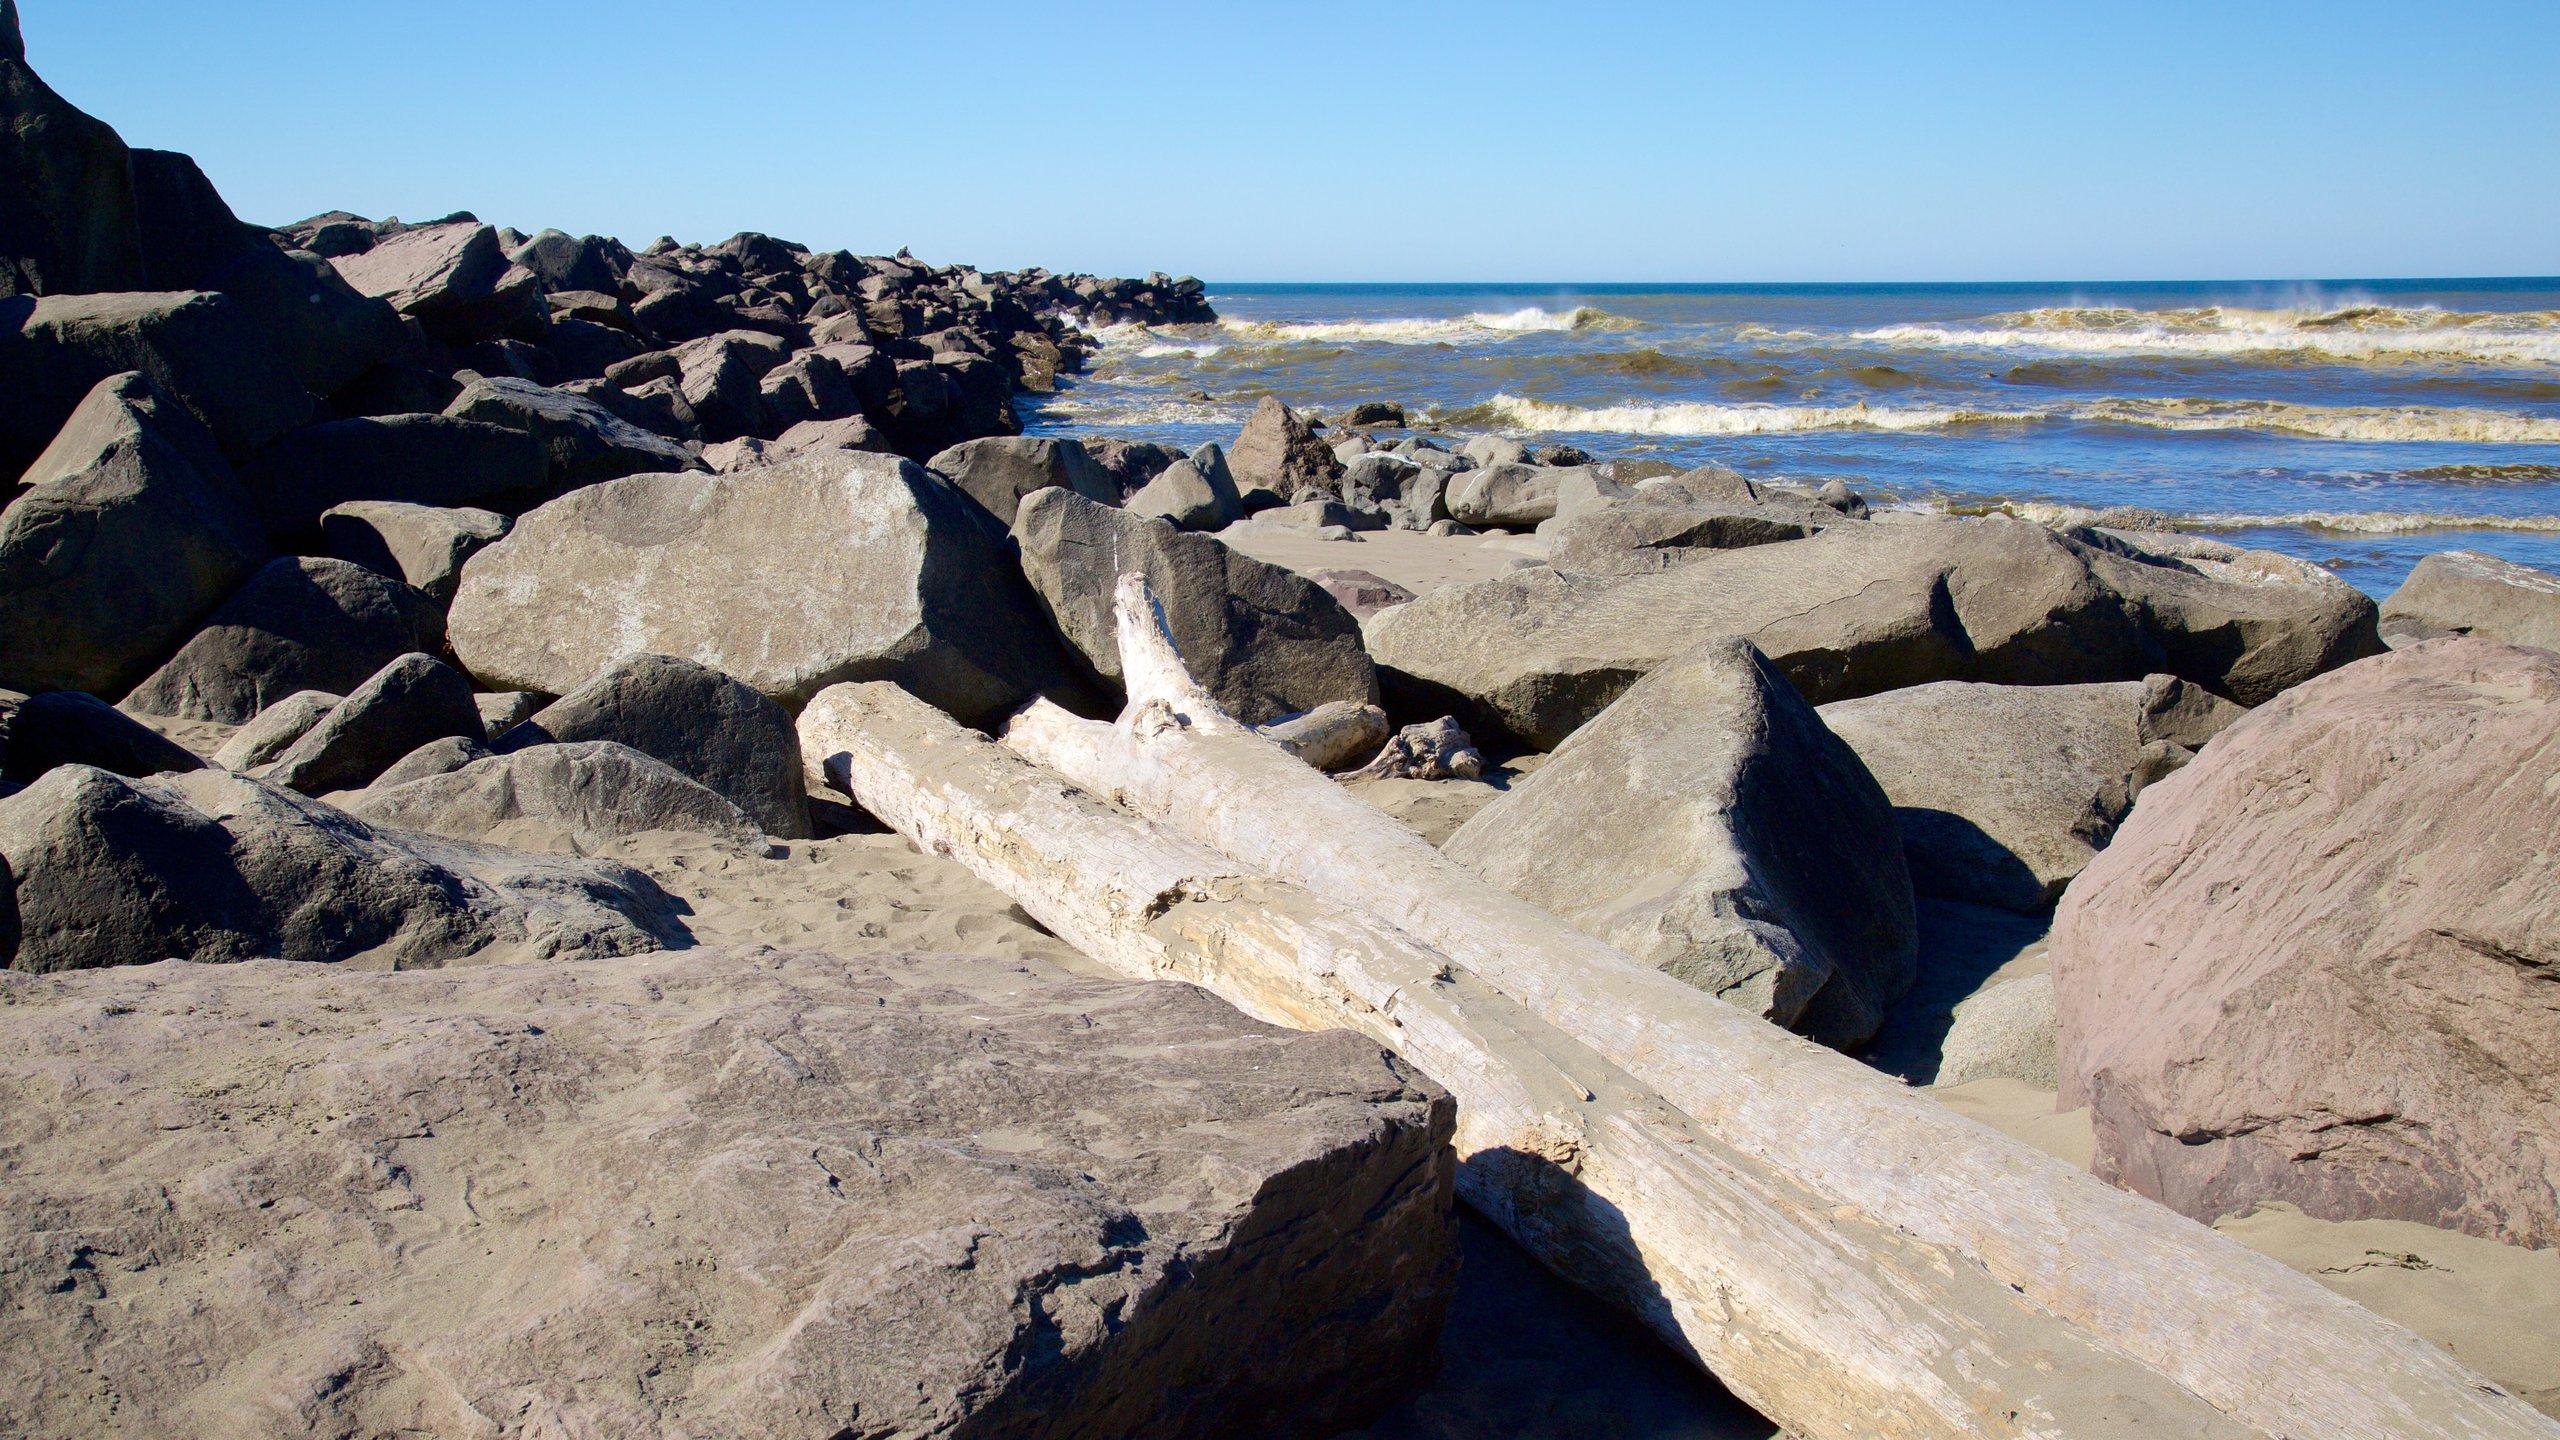 Ocean Shores, Washington, United States of America